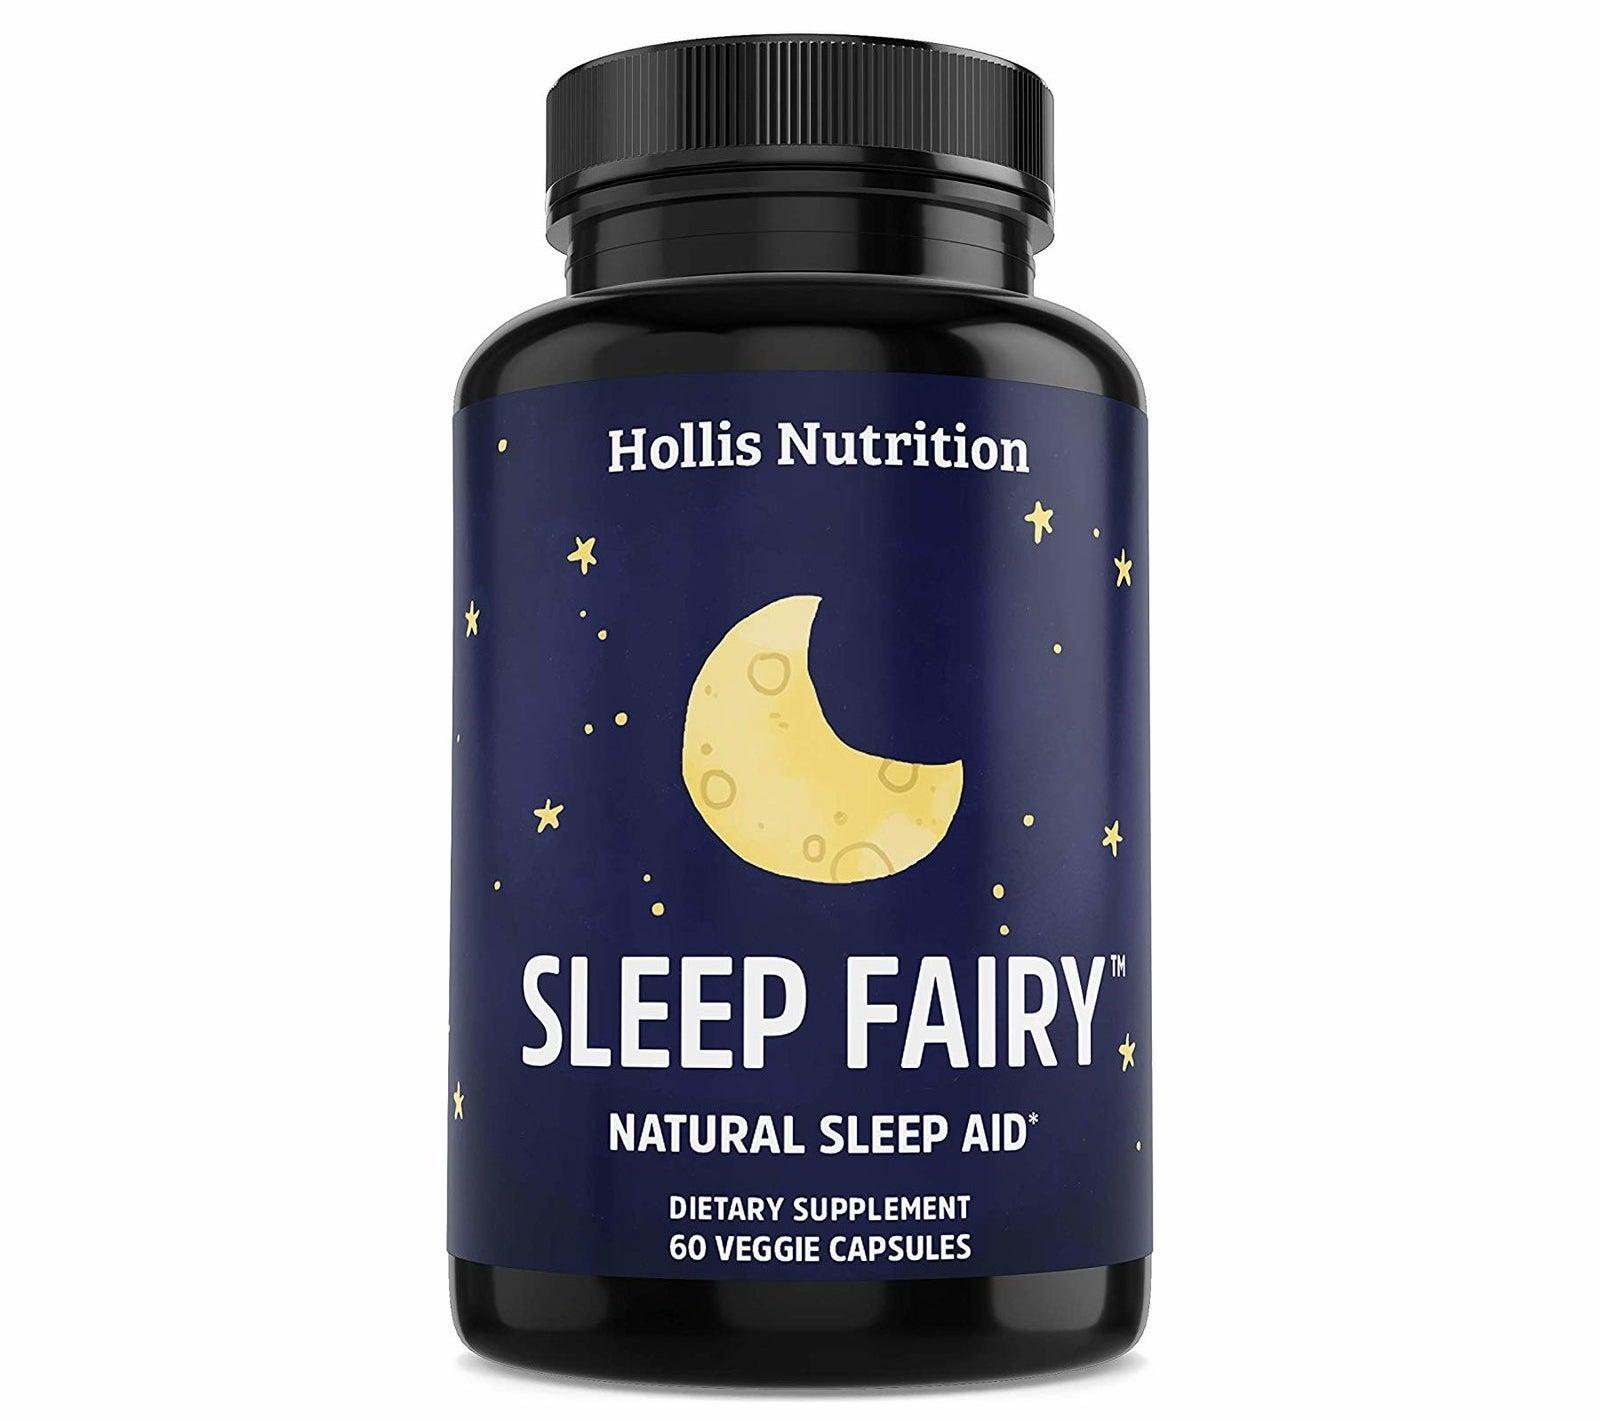 bottle of sleep fairy natural sleep aid